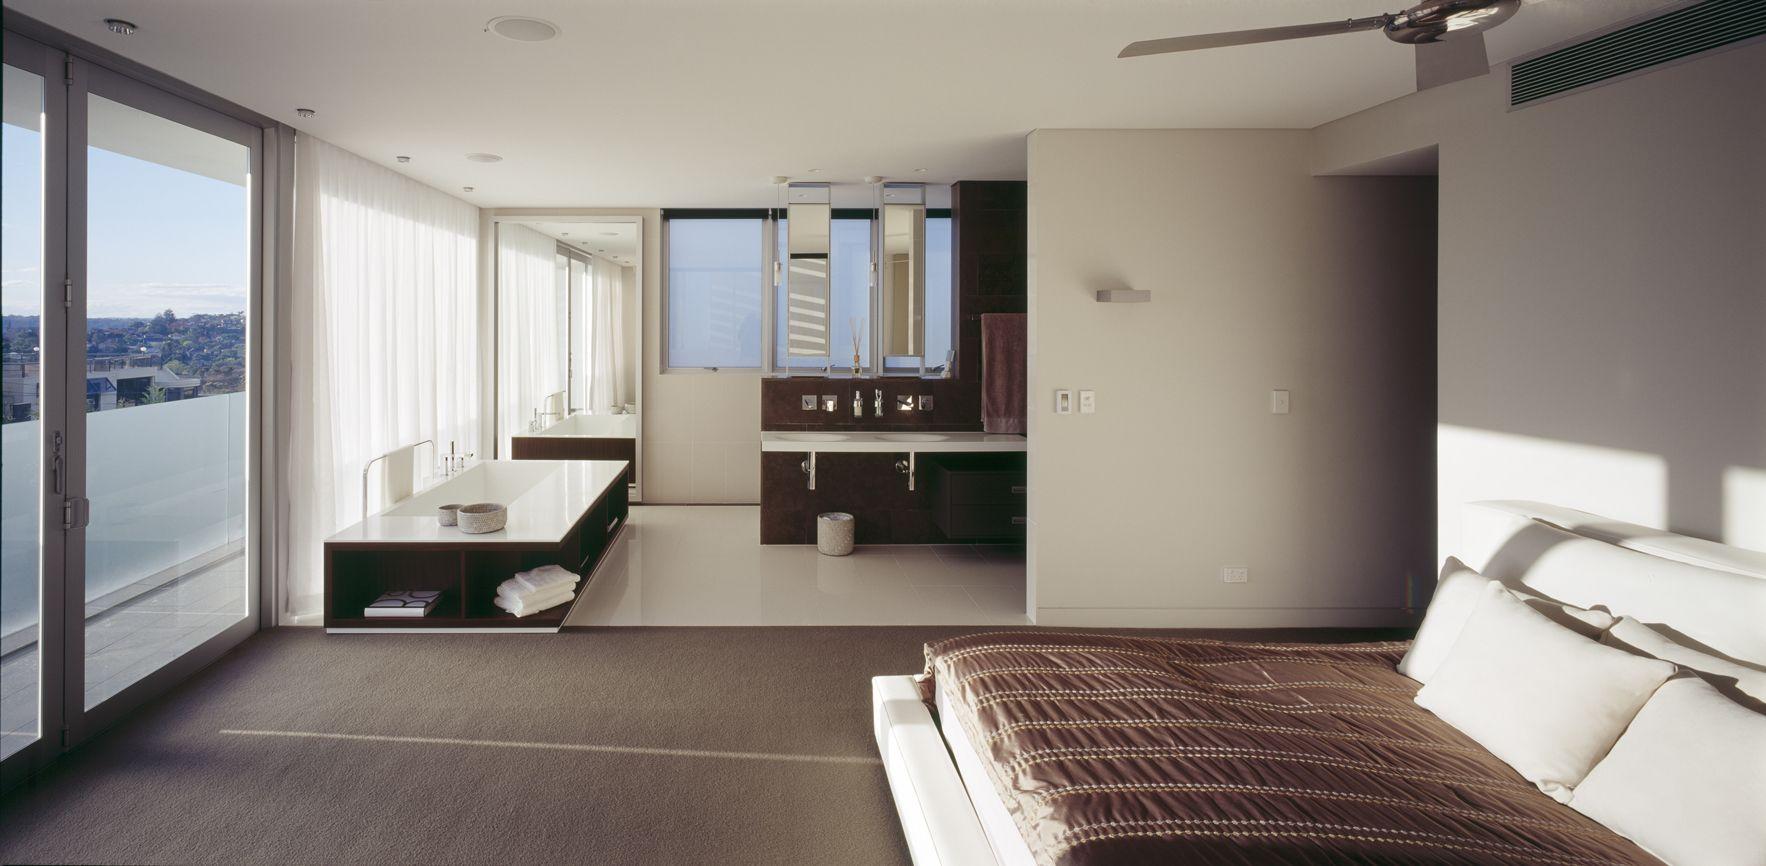 Open Plan Bathroomminosa Designfeatures The Scooped Extraordinary Ensuite Bathroom Design Plans Review